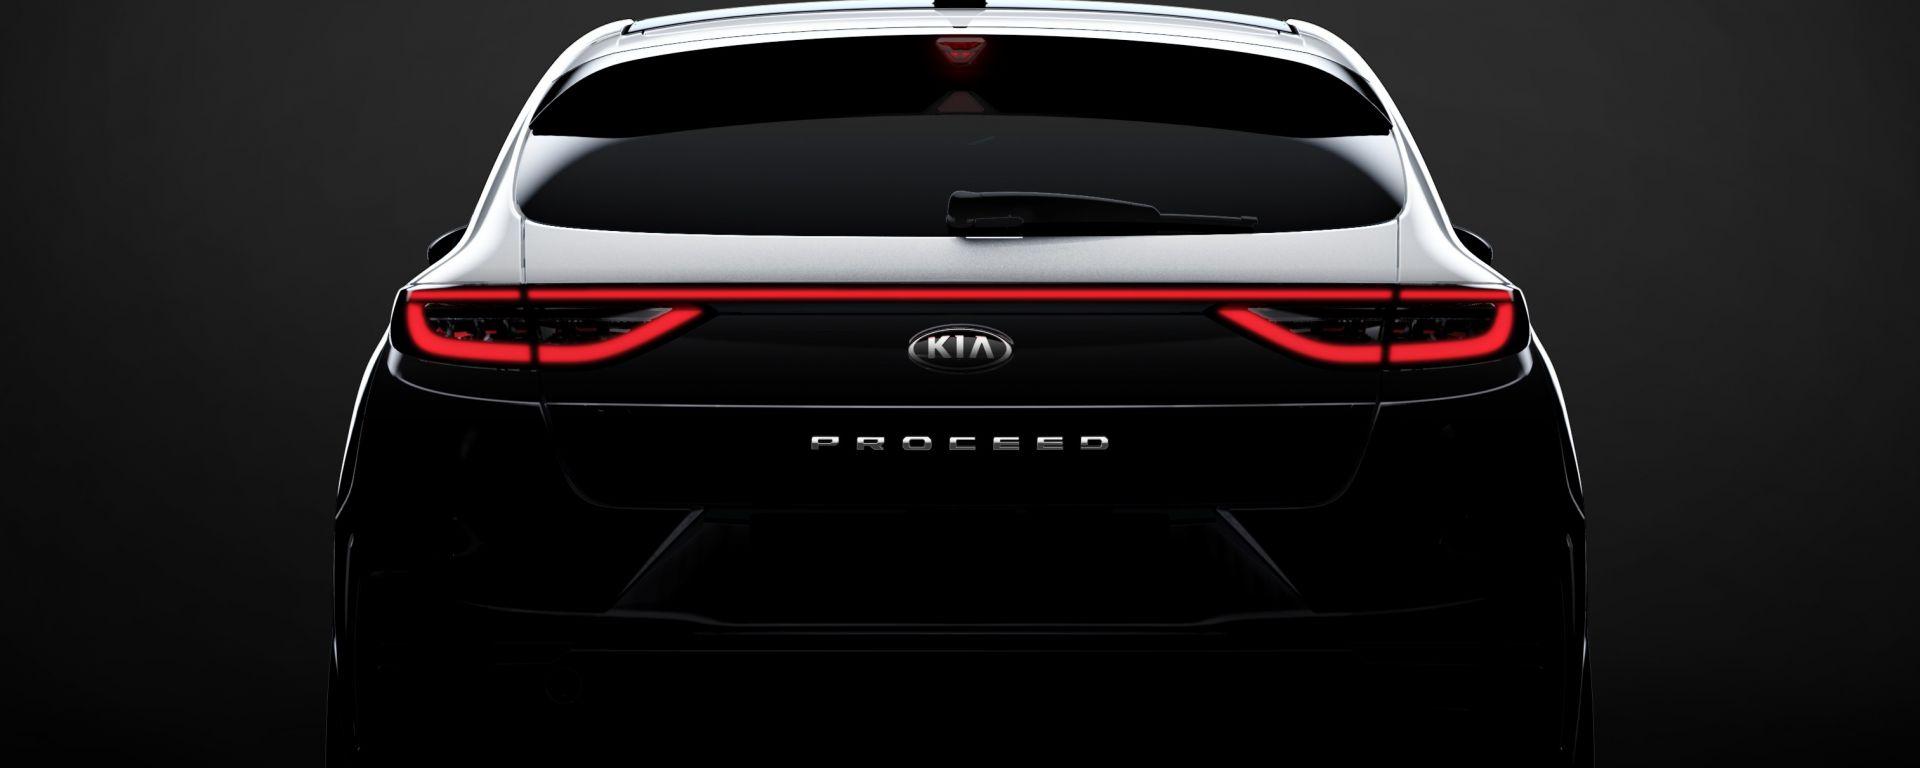 Kia Proceed GT 2019: la prima foto della nuova shooting brake